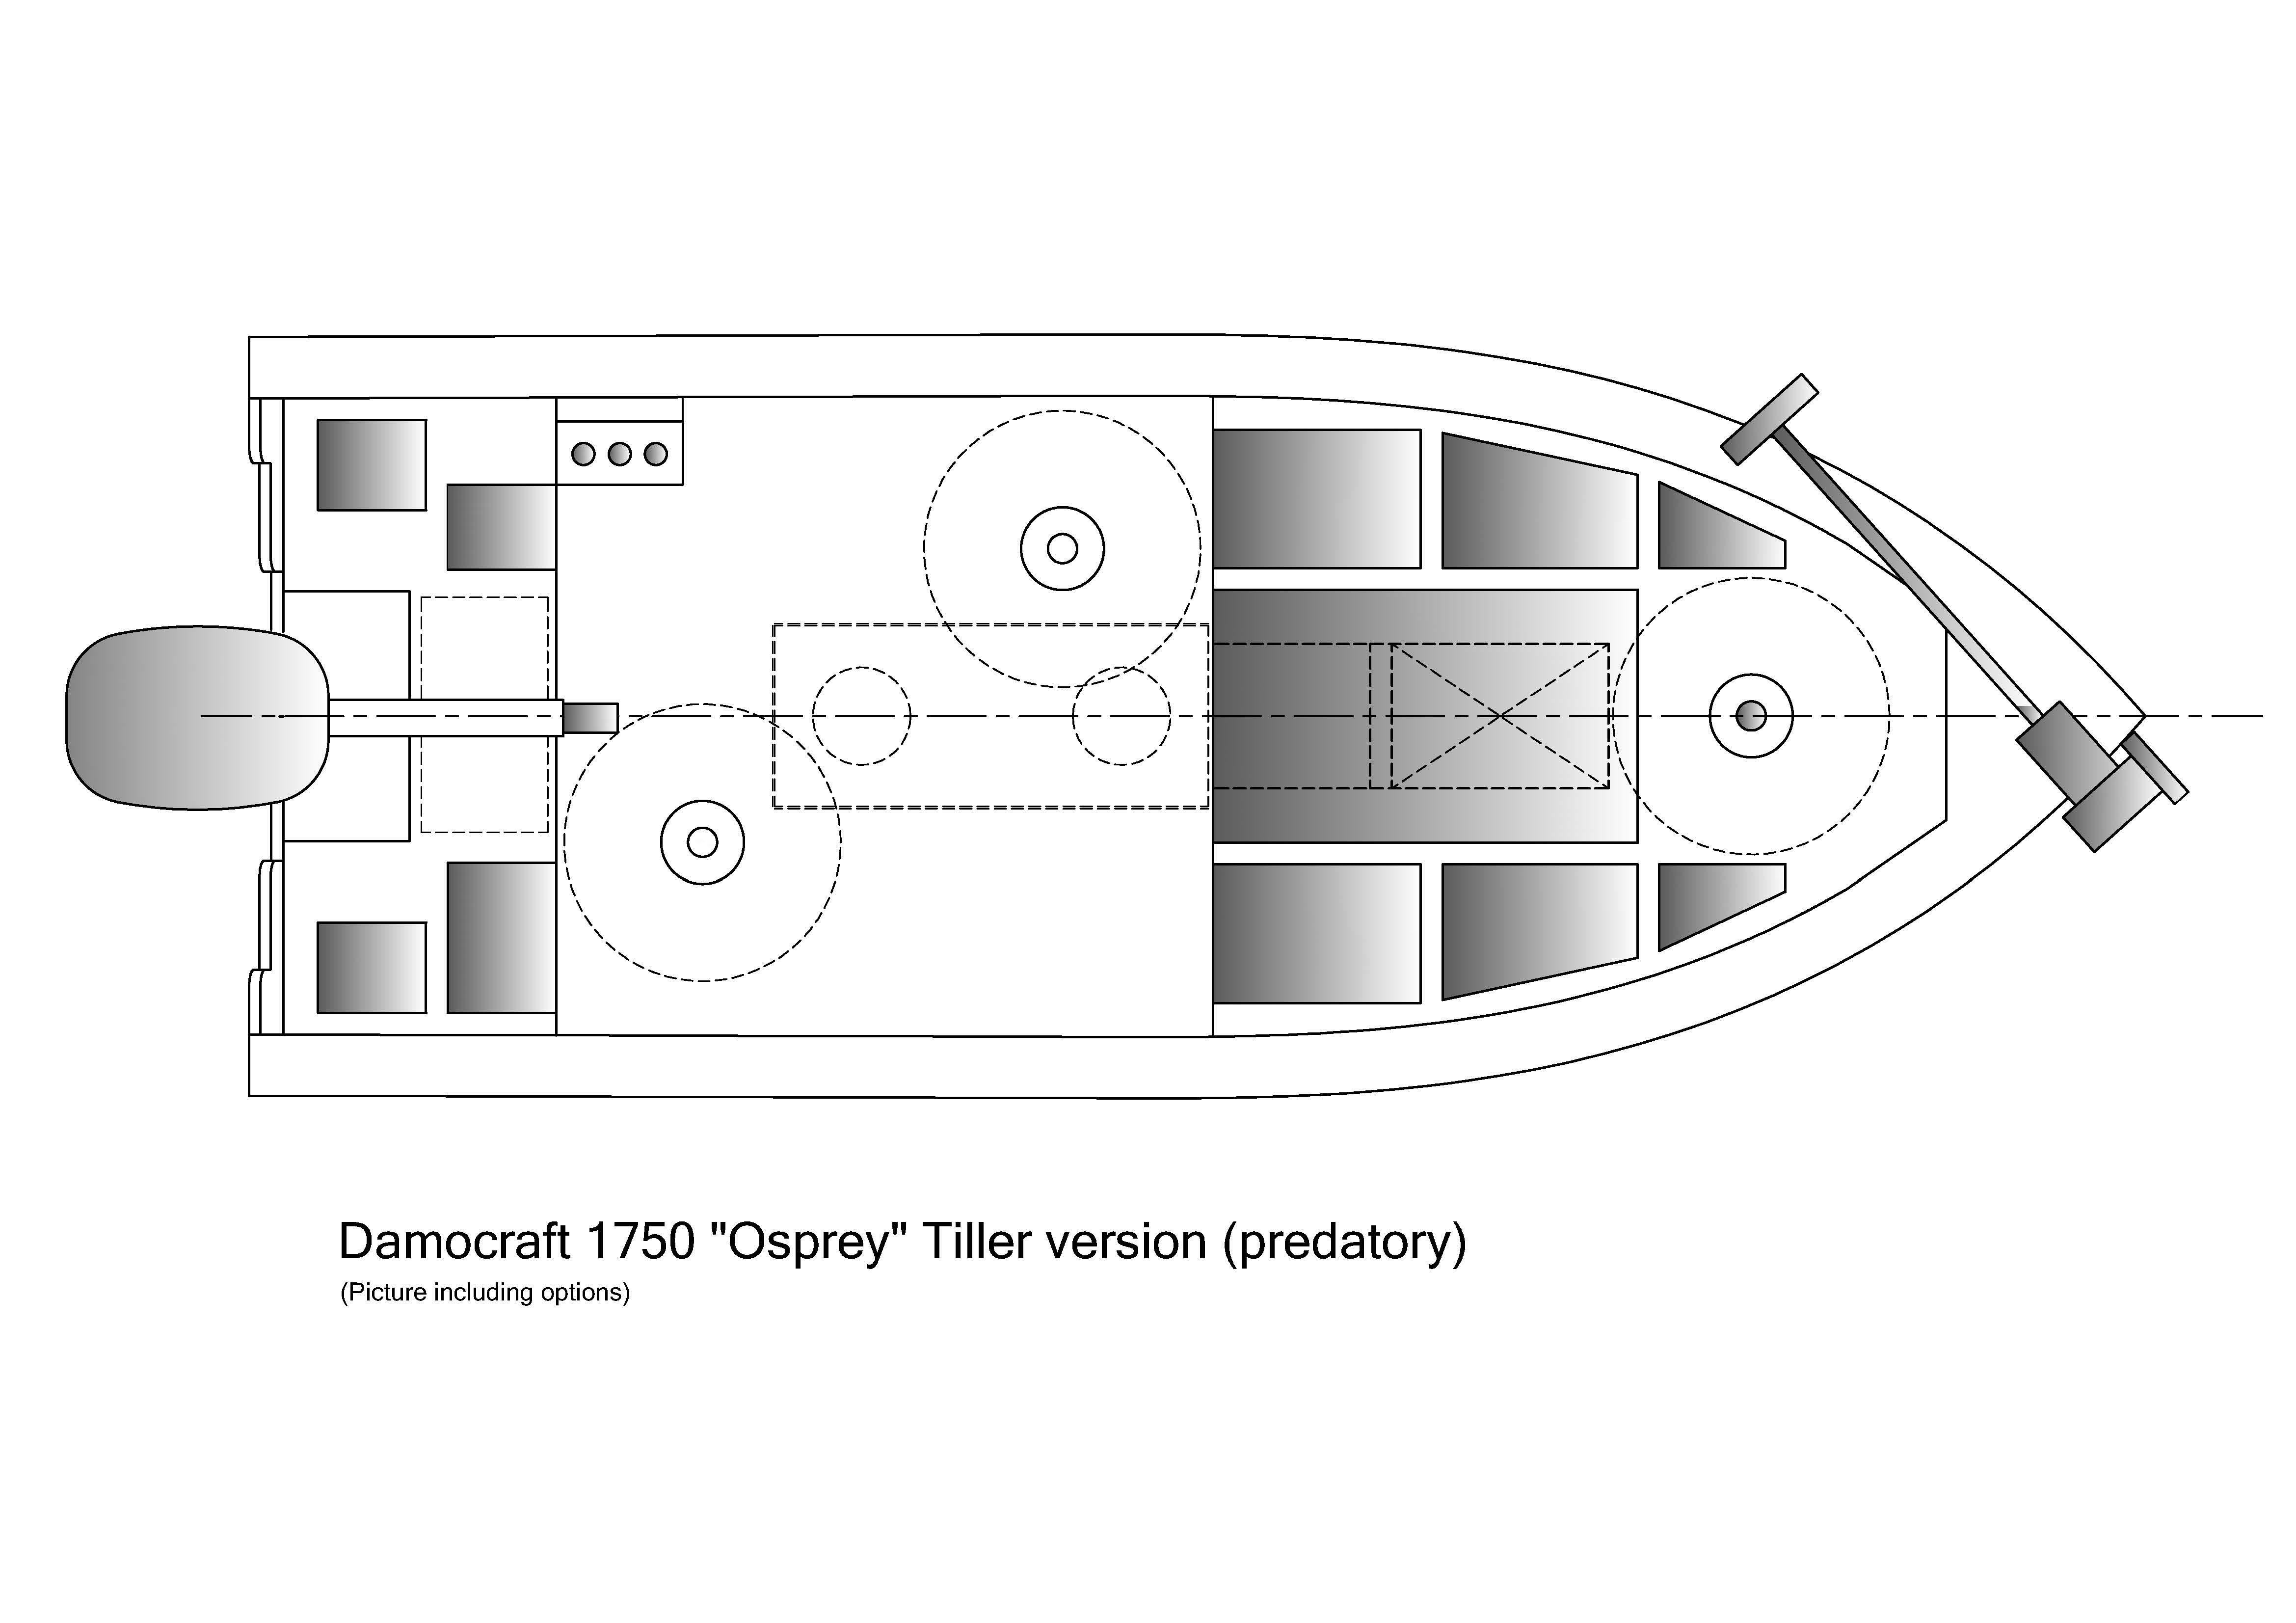 Damocraft 1750 Osprey Tiller version (predatory)